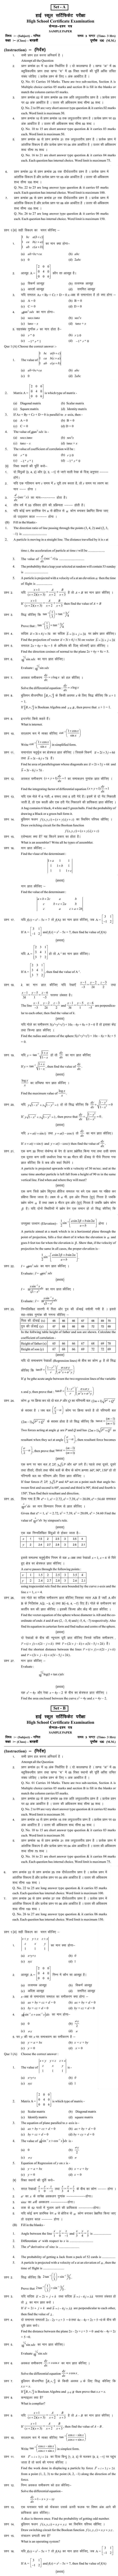 Chattisgarh Board Class 12 MathematicsSample Paper